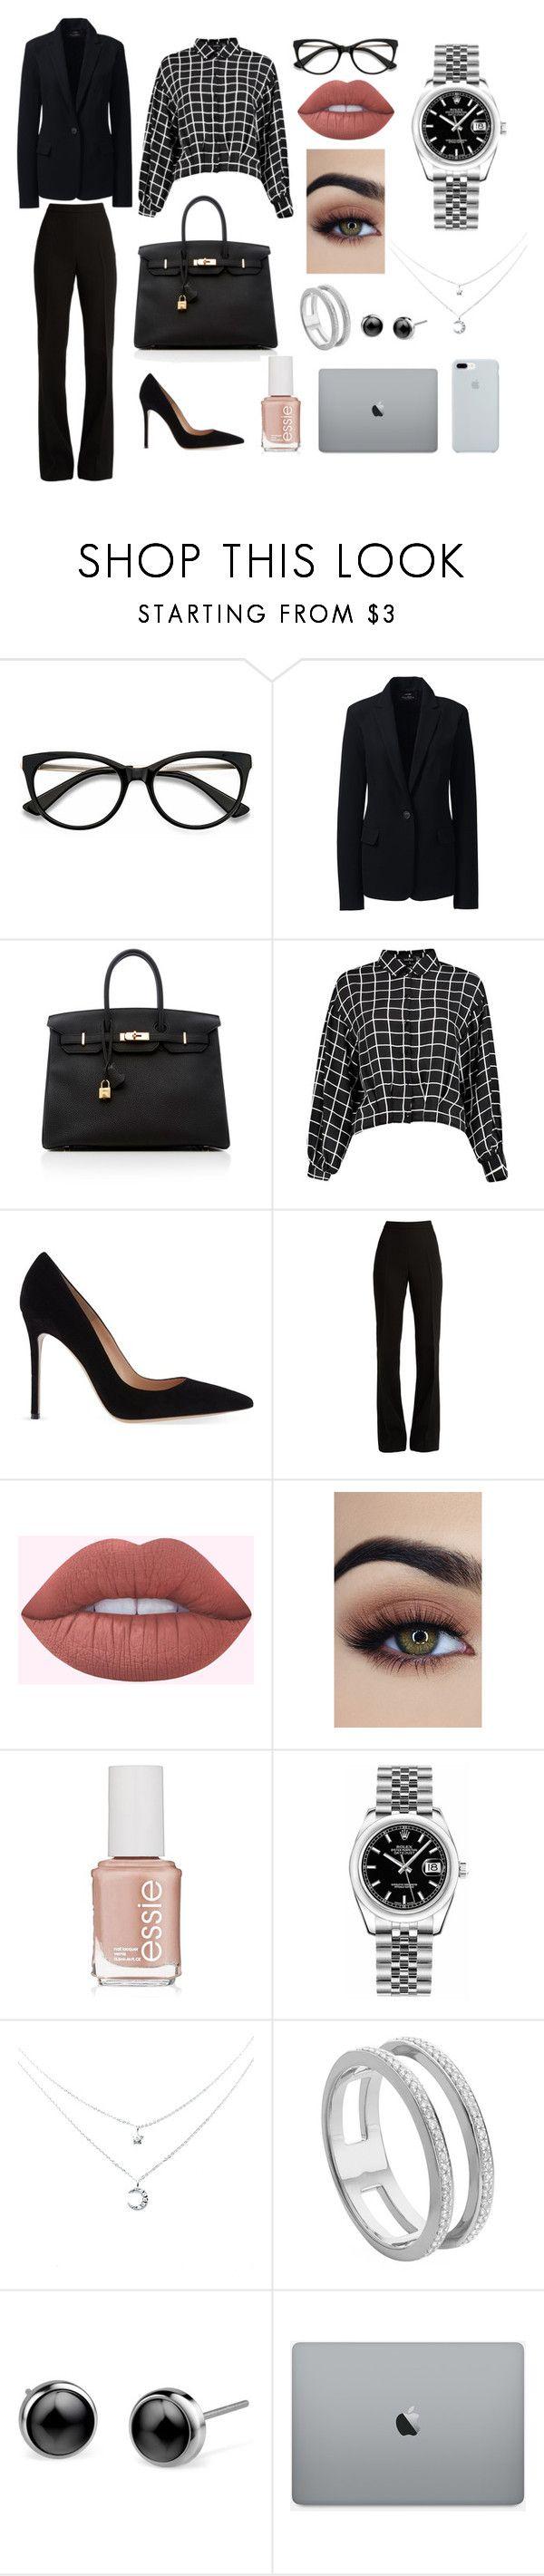 """saco negro"" by patriciaoroscorecalde on Polyvore featuring moda, EyeBuyDirect.com, Lands' End, Hermès, Gianvito Rossi, Giambattista Valli, Essie, Rolex y Monica Vinader"